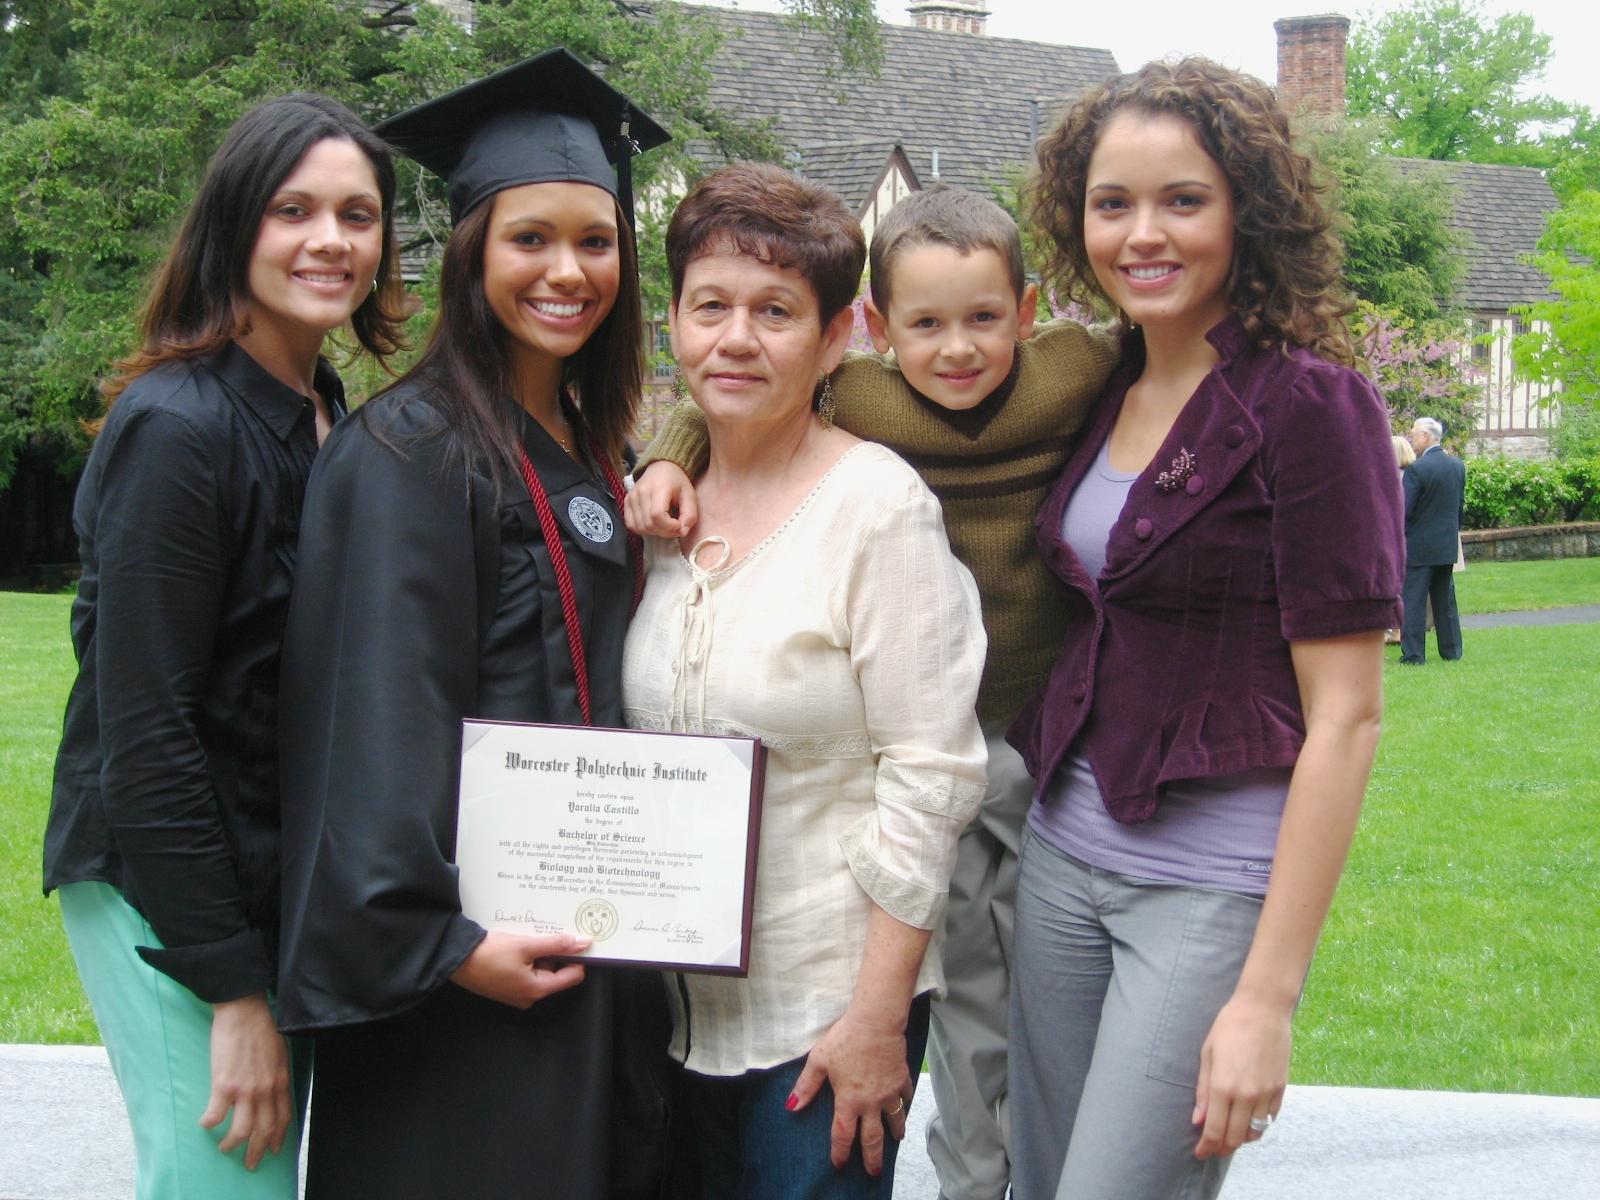 - My little sister, Yaralia's, college graduation.